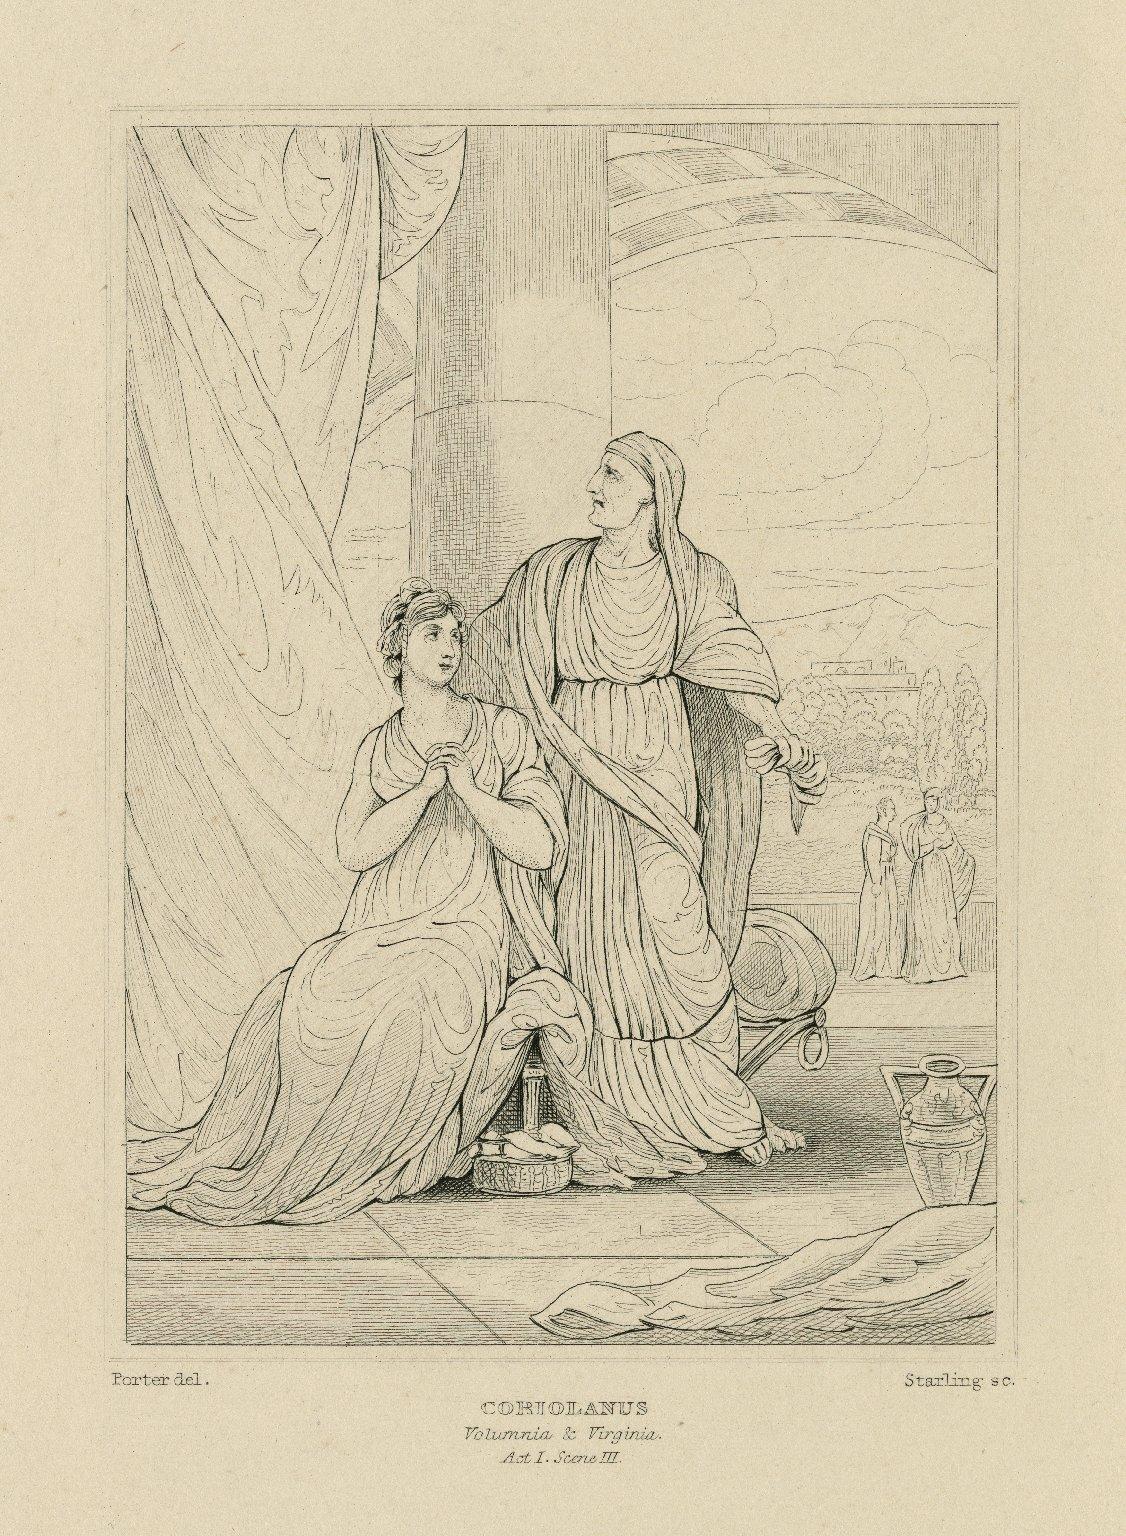 Coriolanus: Volumnia & Virginia [sic], act I, scene III [graphic] / Porter, del. ; Starling, sc.